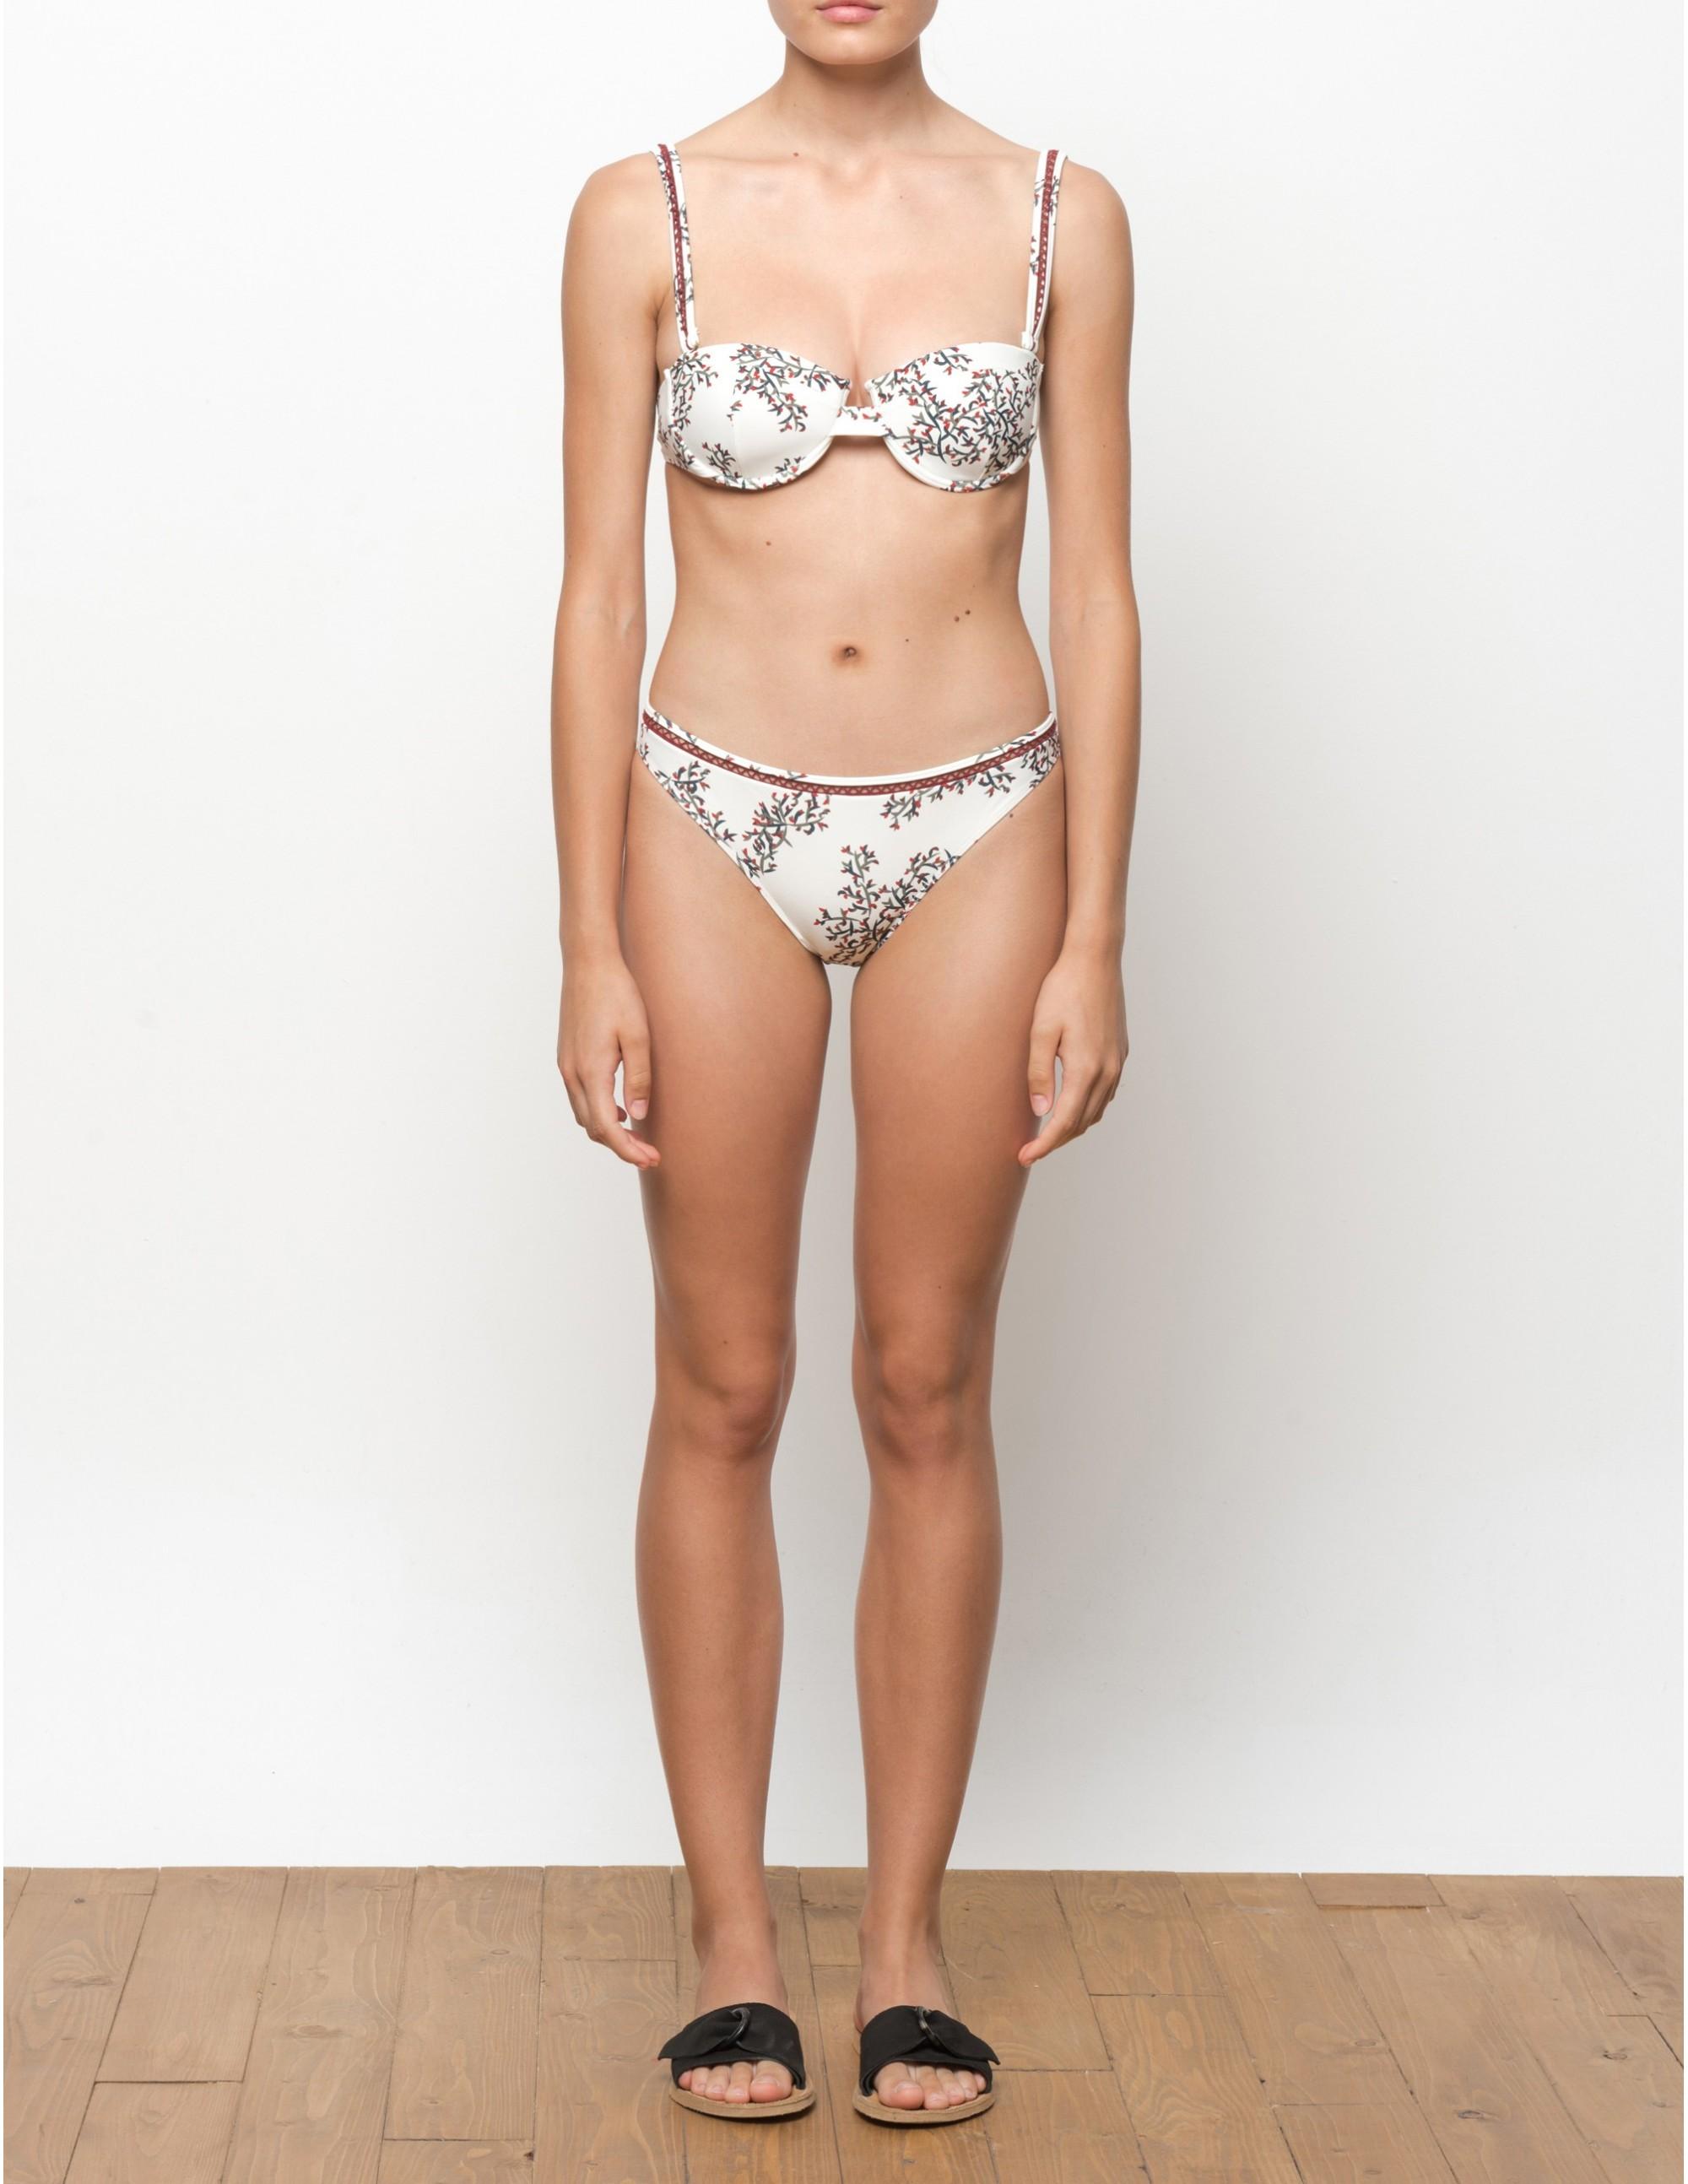 BELLA bikini bottom - ACACIA